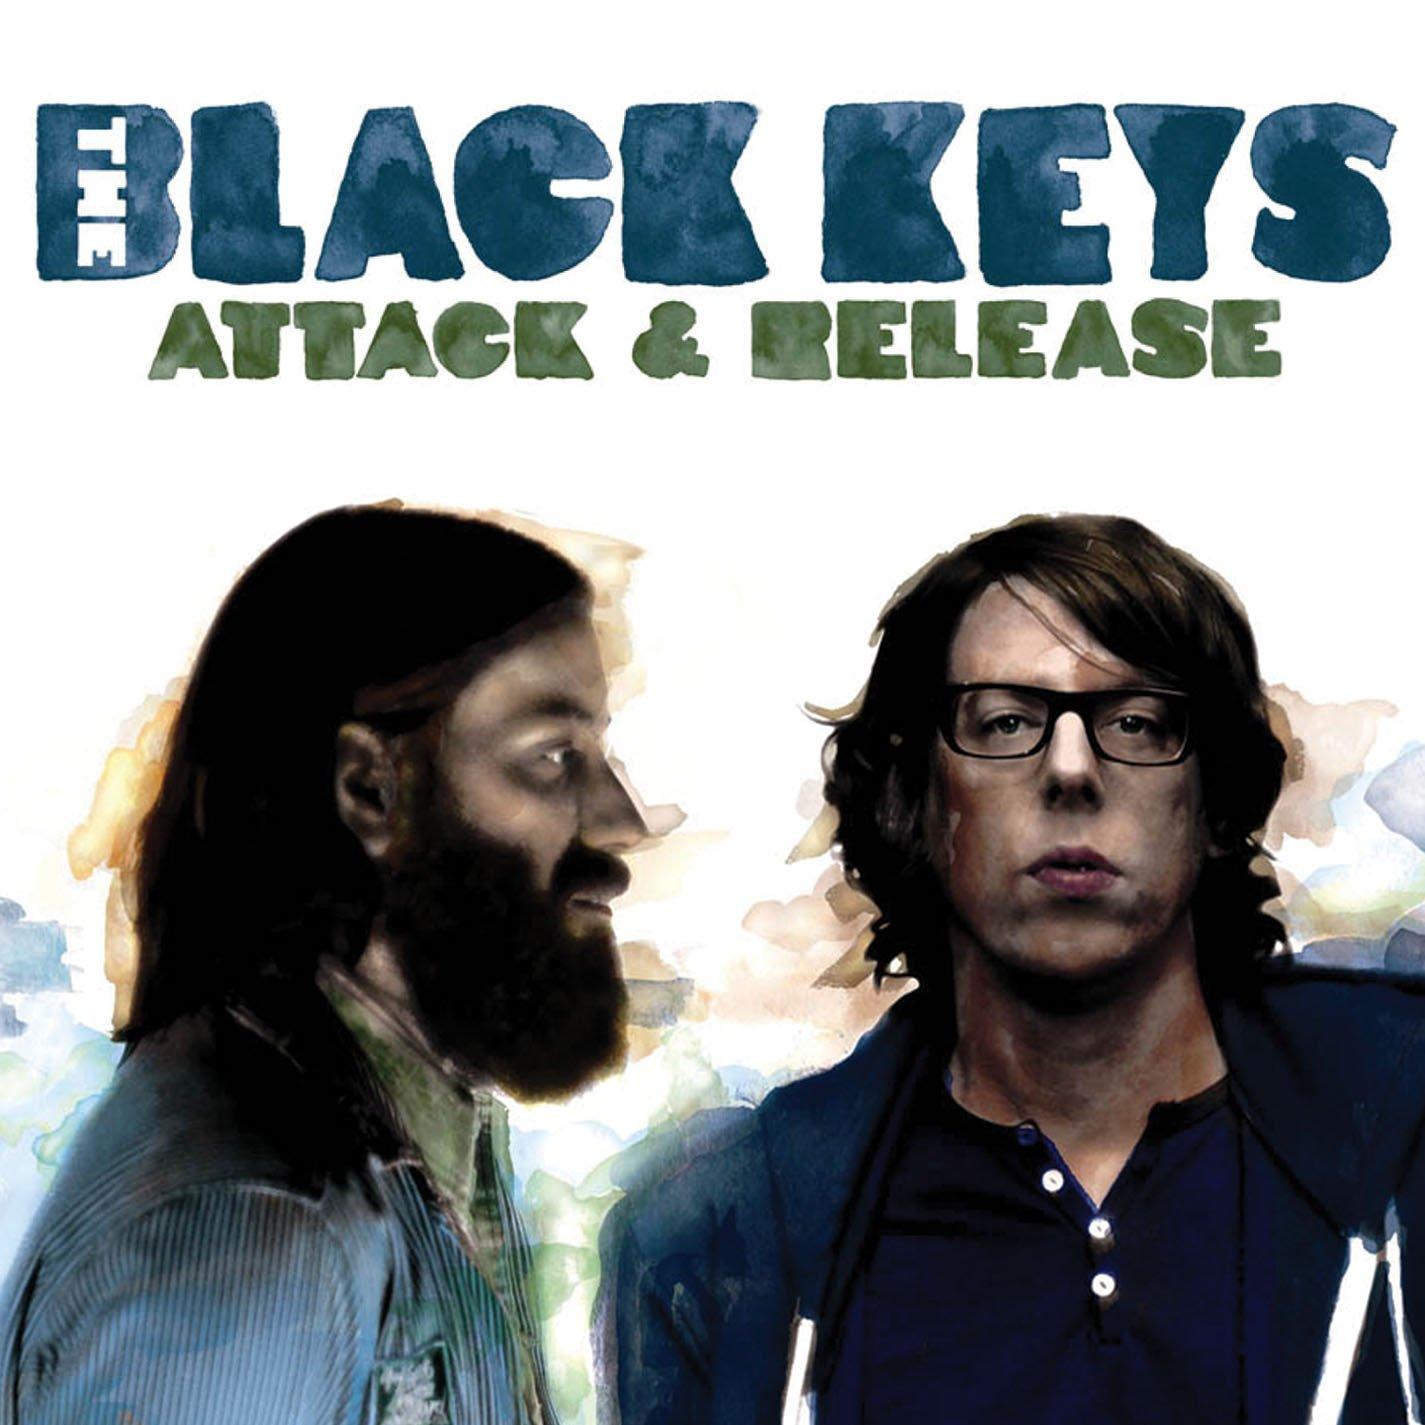 Attack & Release [Vinyl] by Black Keys